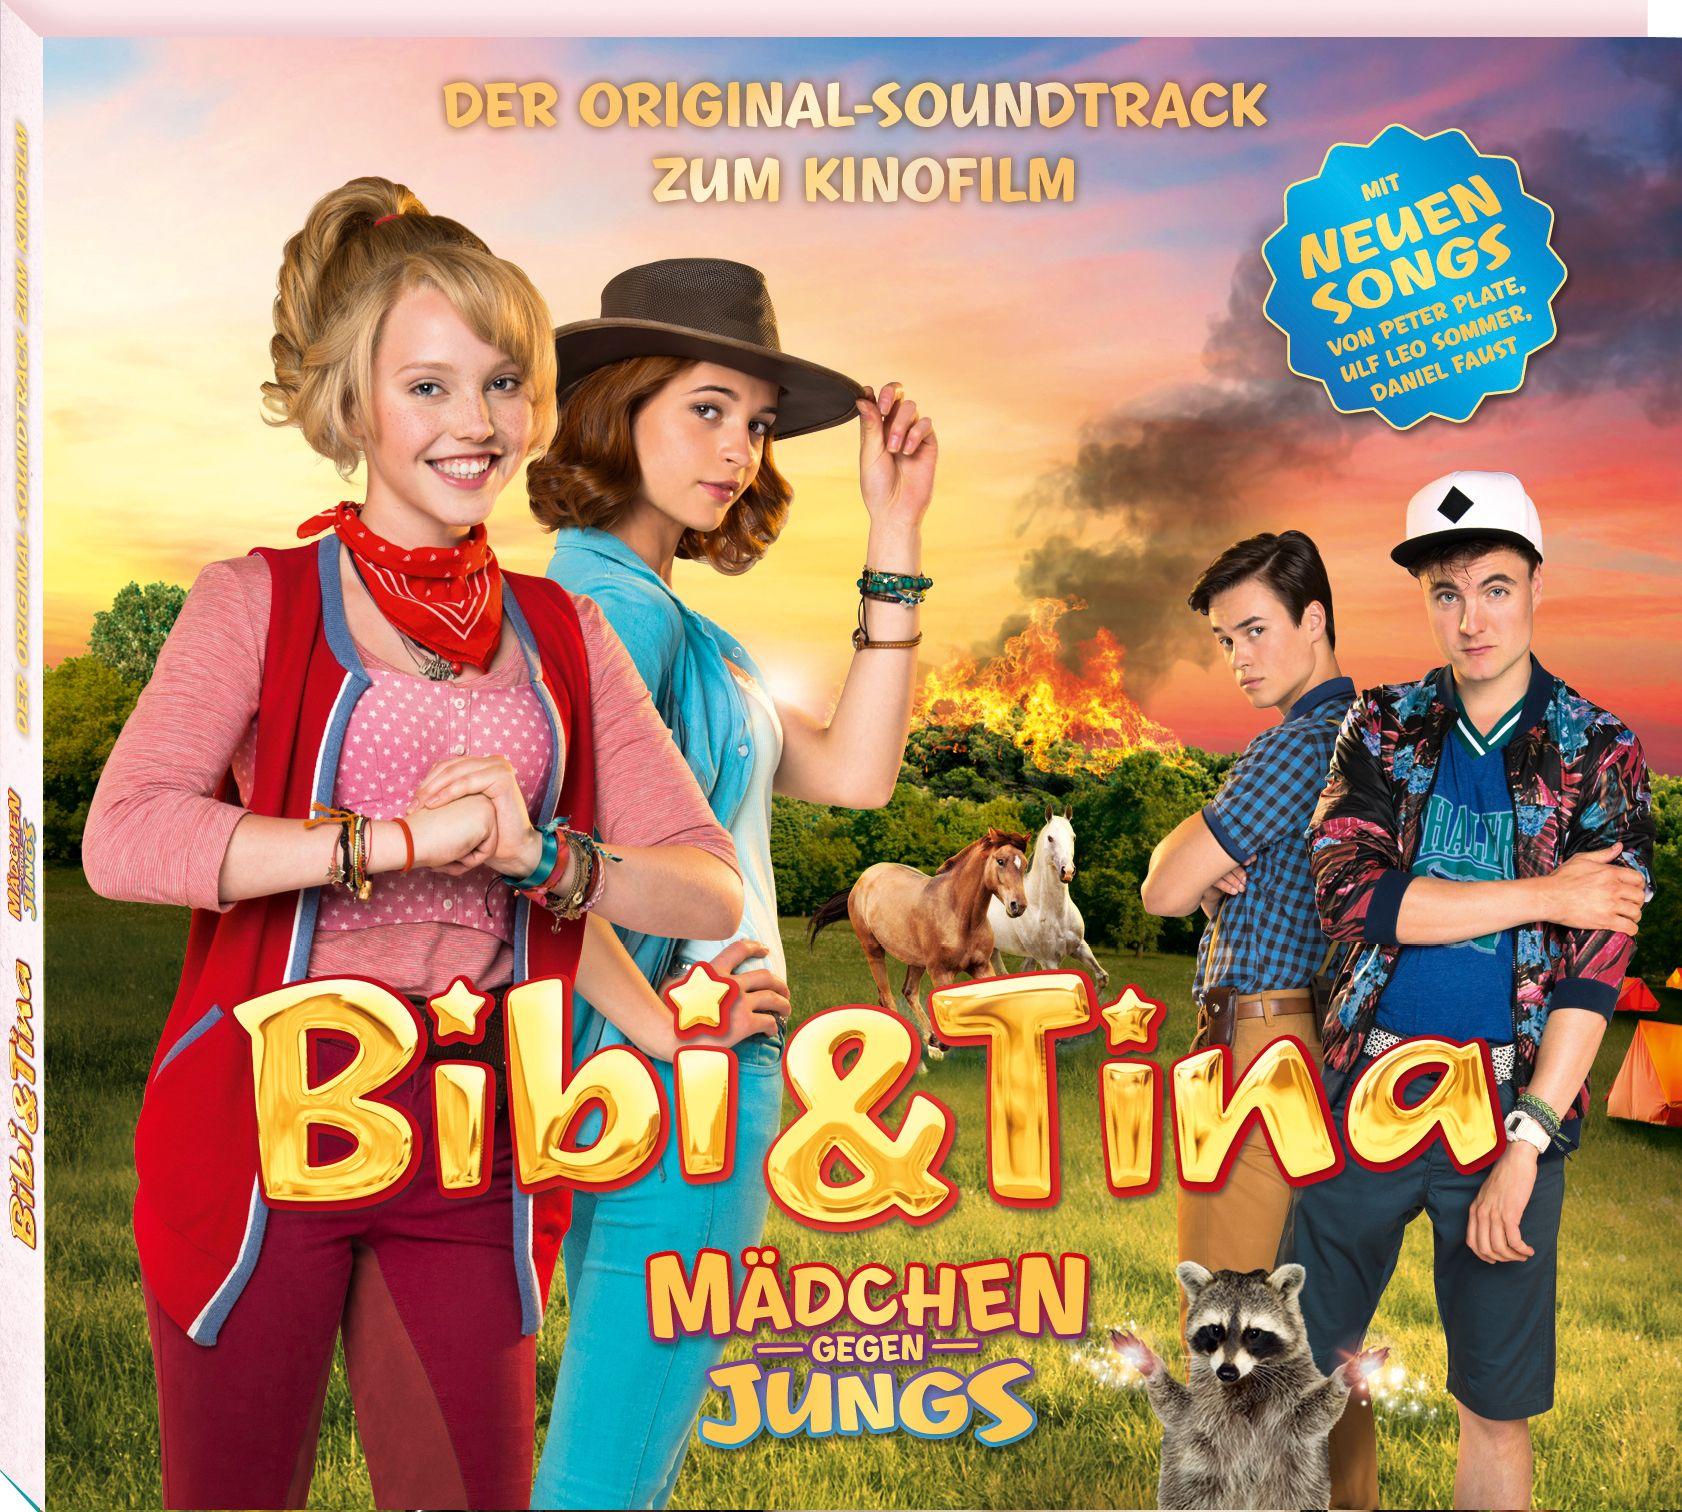 Bibi & Tina: Mädchen gegen Jungs - Kinofilm 3 S...